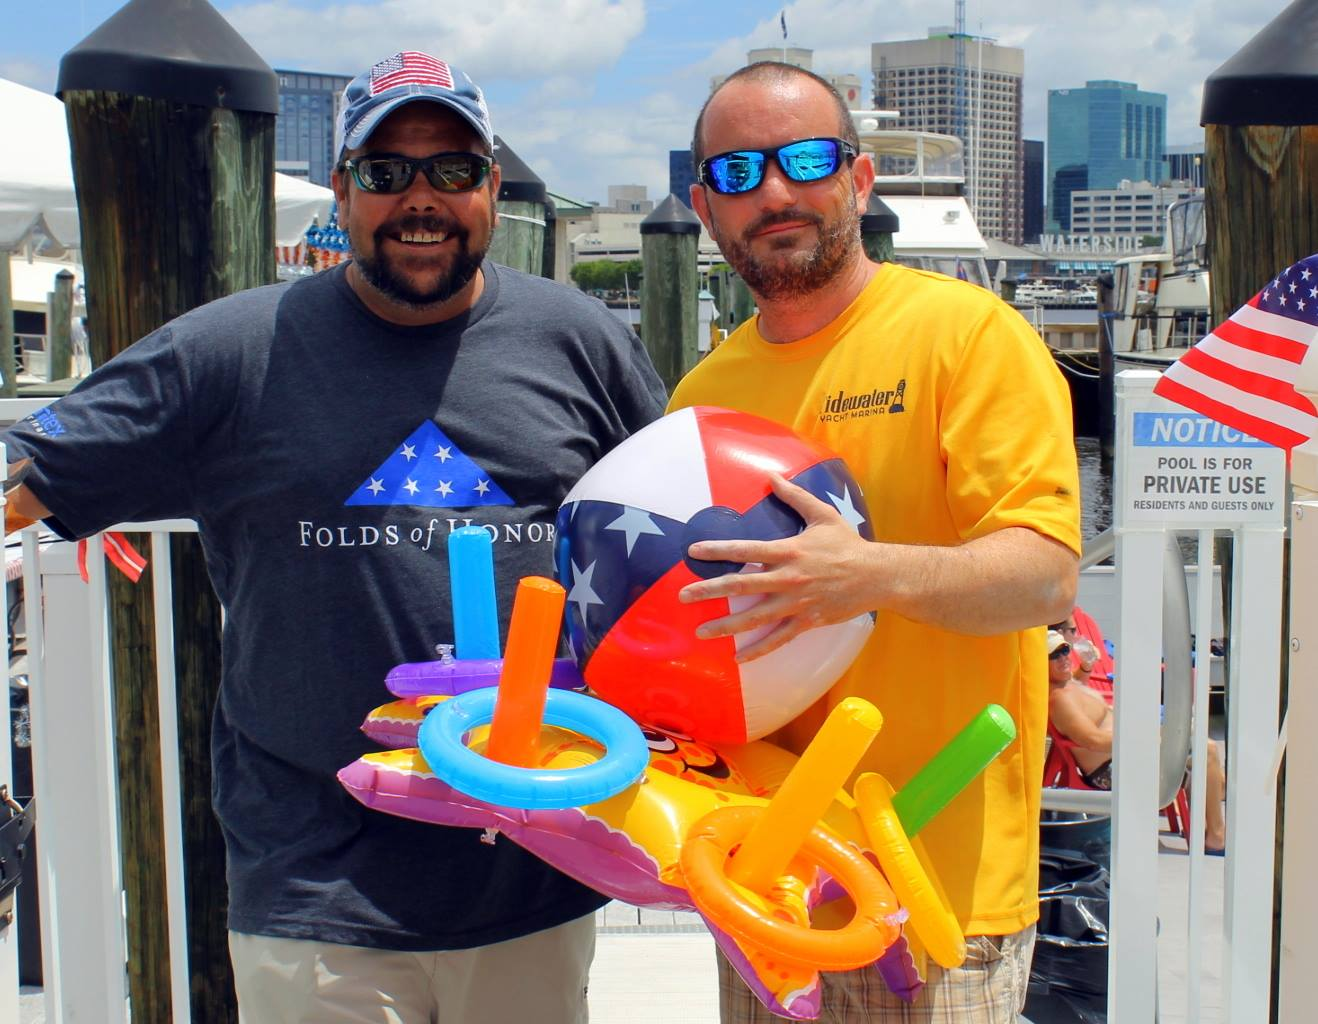 tidewater_yacht_marina_pool_party.jpg